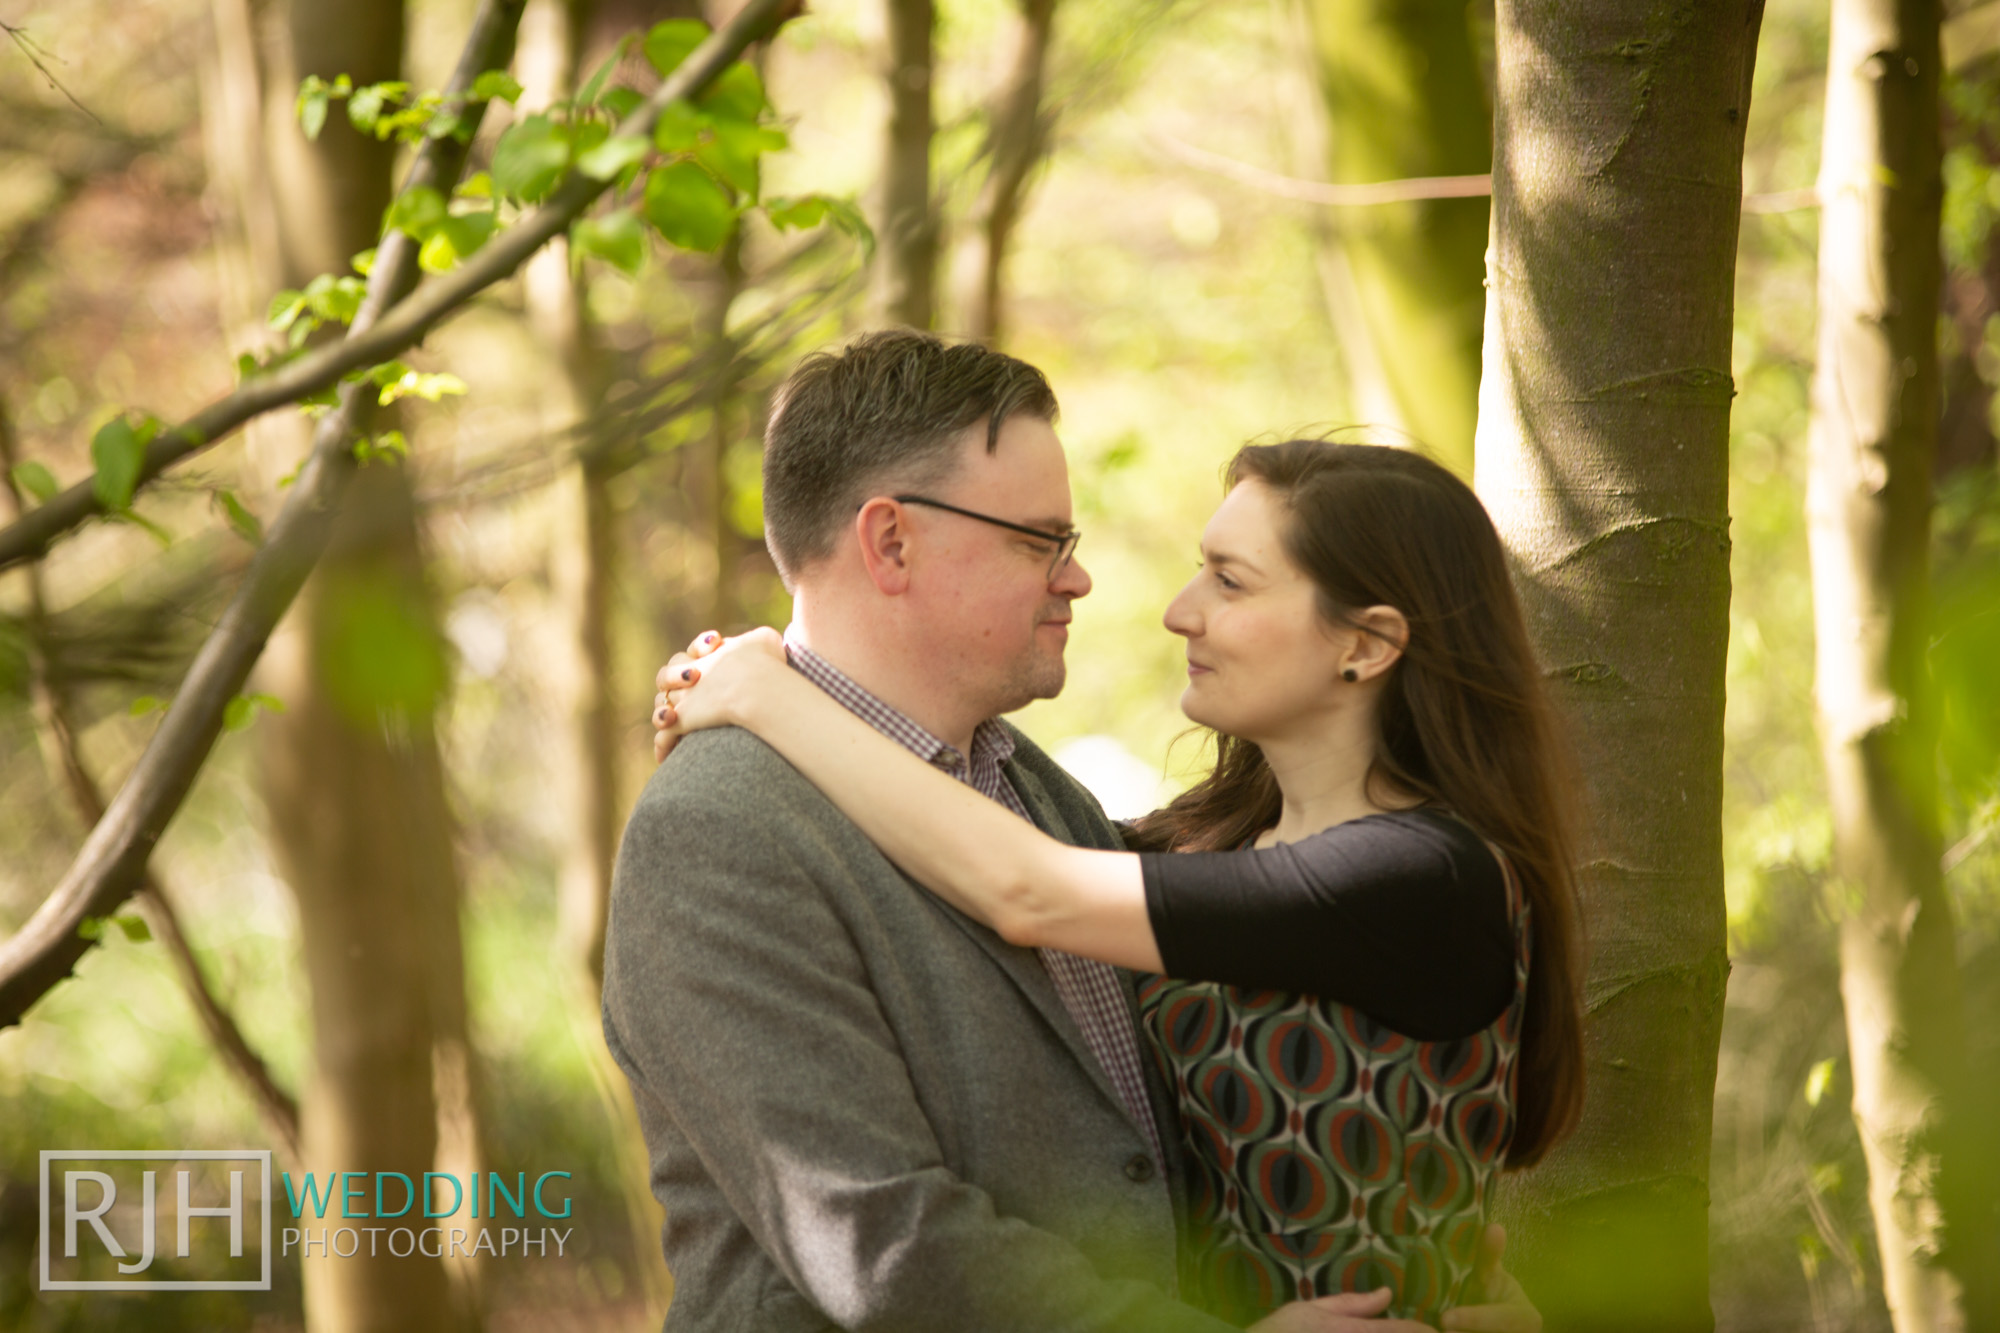 Pre-wedding photography - Richard & Rachel_007_3C2A8151.jpg